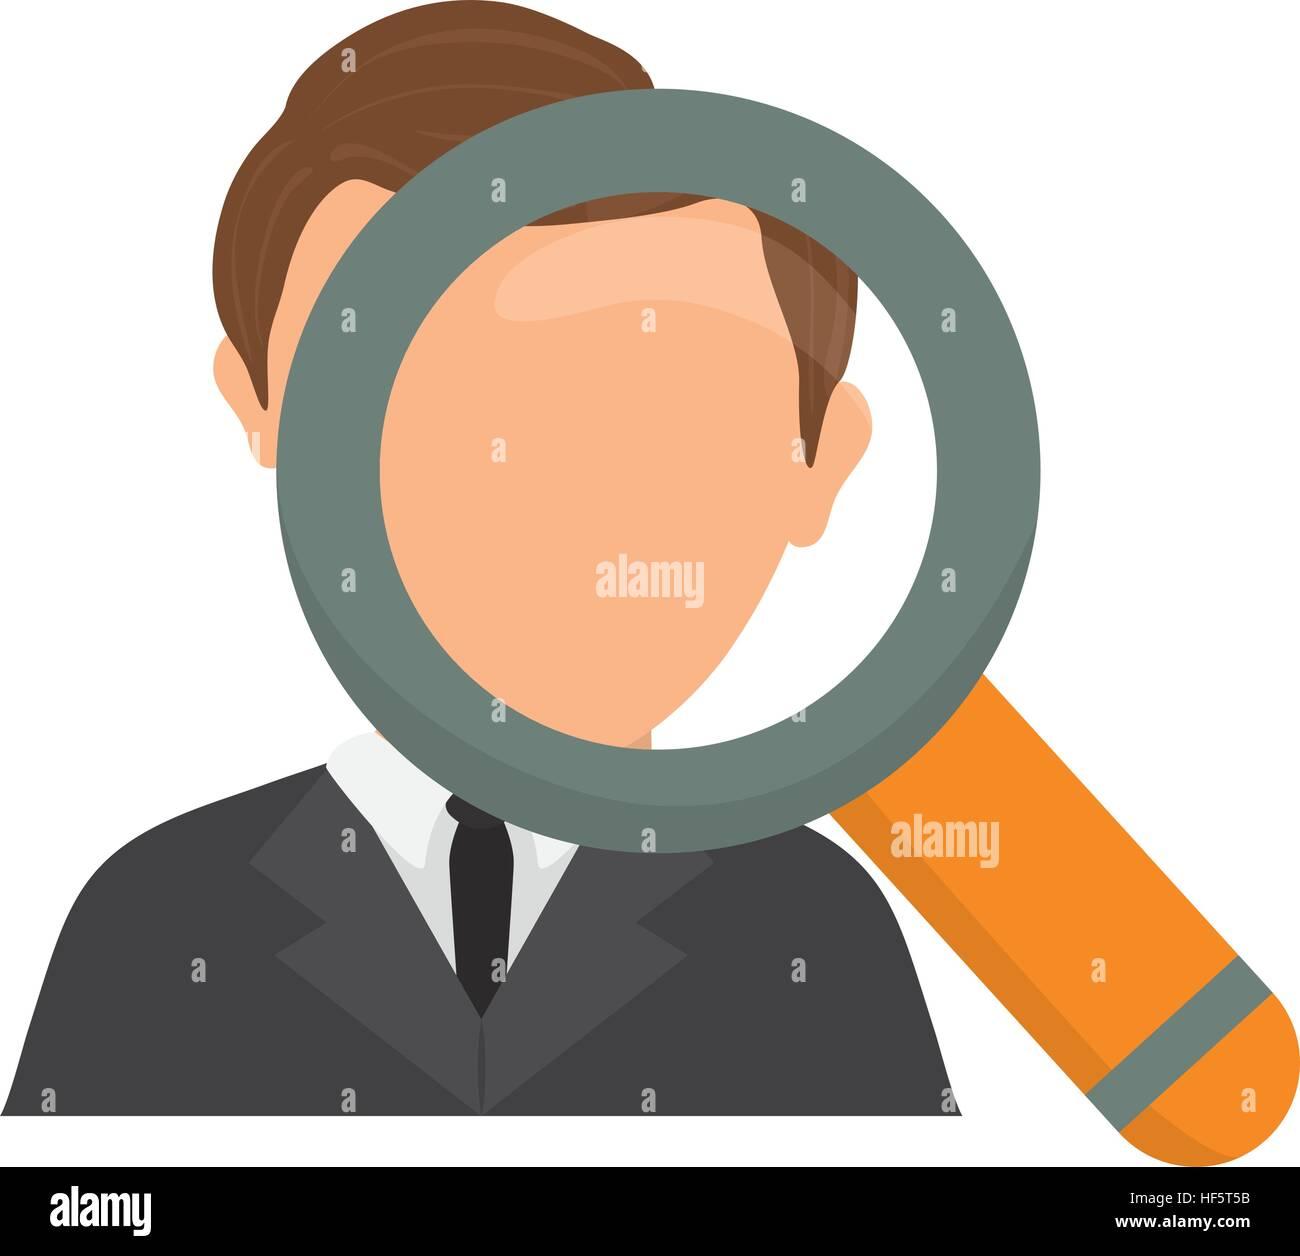 Cartoon Character Magnifying Glass Man Imágenes De Stock & Cartoon ...